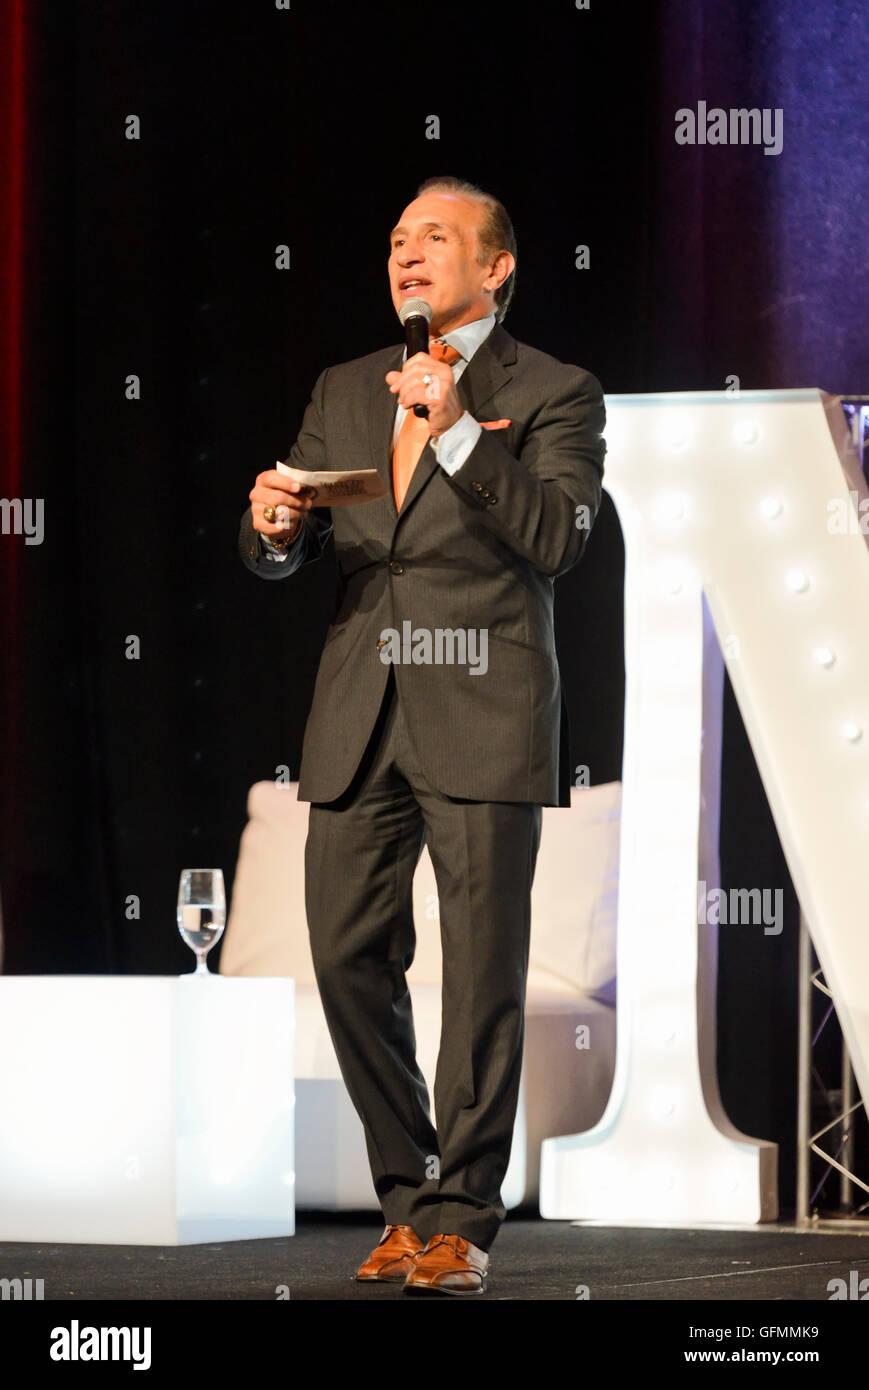 Las Vegas, Nevada, USA. 30th July, 2016. Ray 'Boom Boom' Mancini honored at the 4th Annual Nevada Boxing - Stock Image